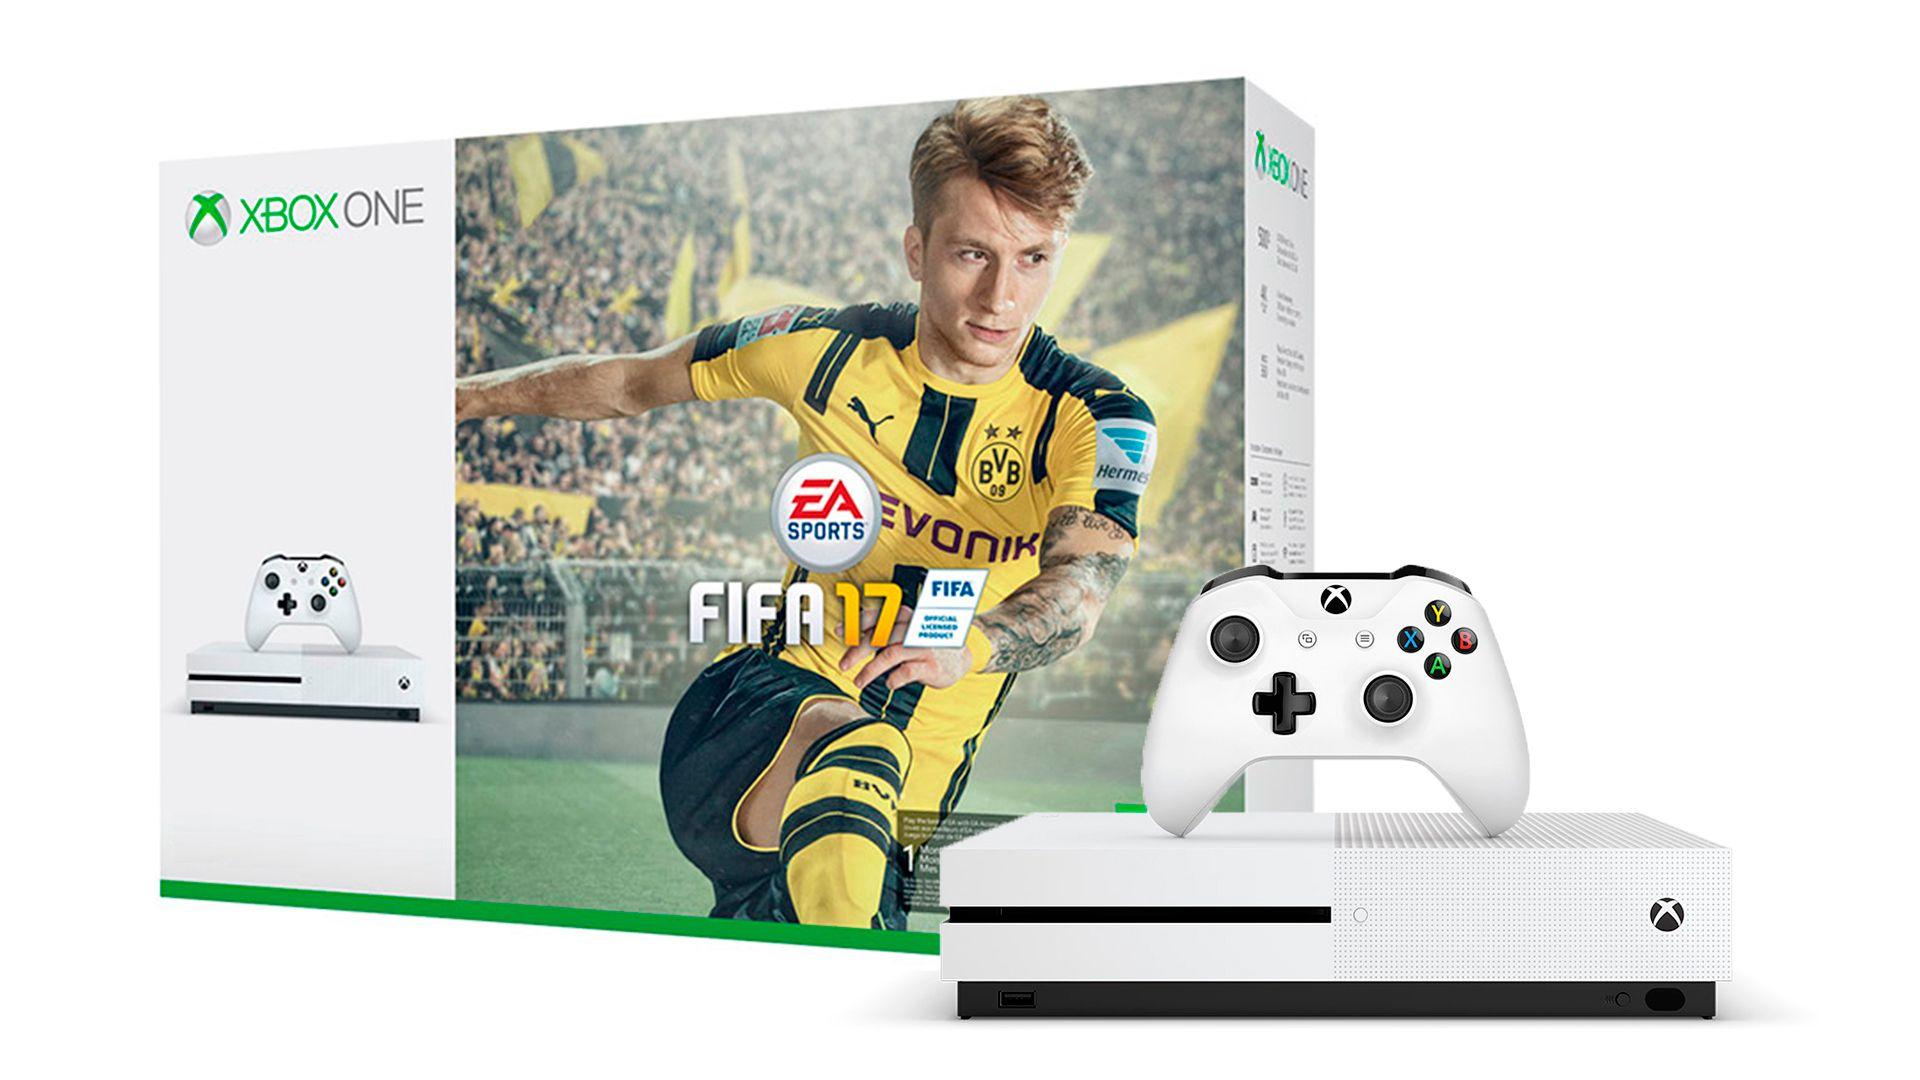 Xbox One S 1TB игровая приставка и игра FIFA 17 [SXO1F]